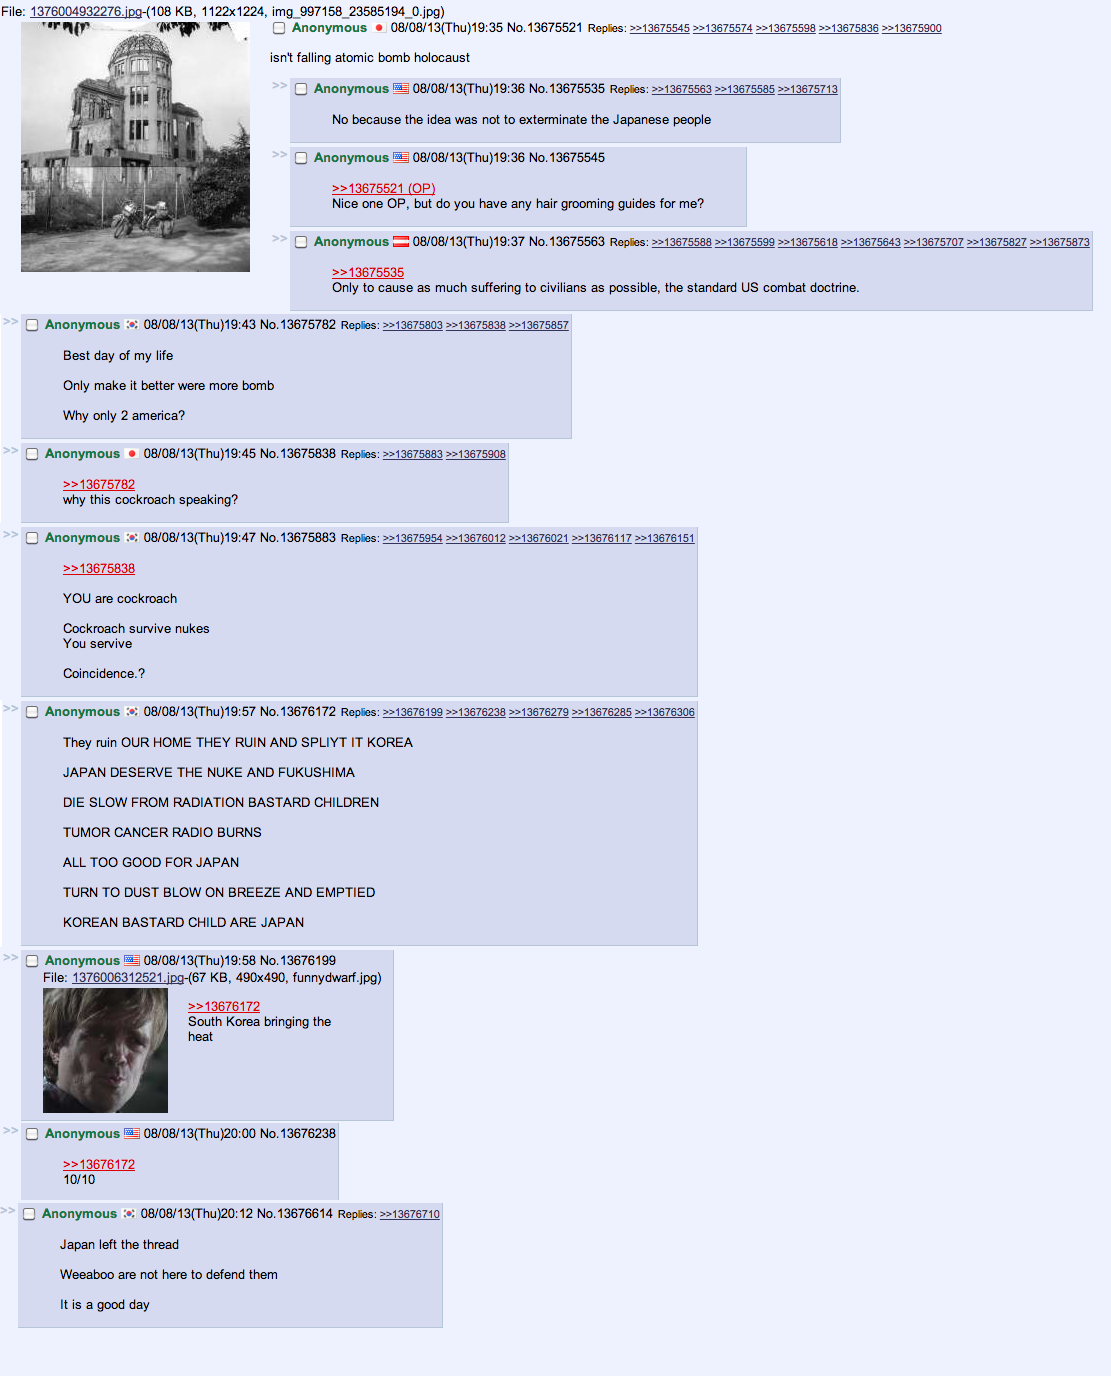 kipling general thread image without posting fuck dare people shouldnt close random telling